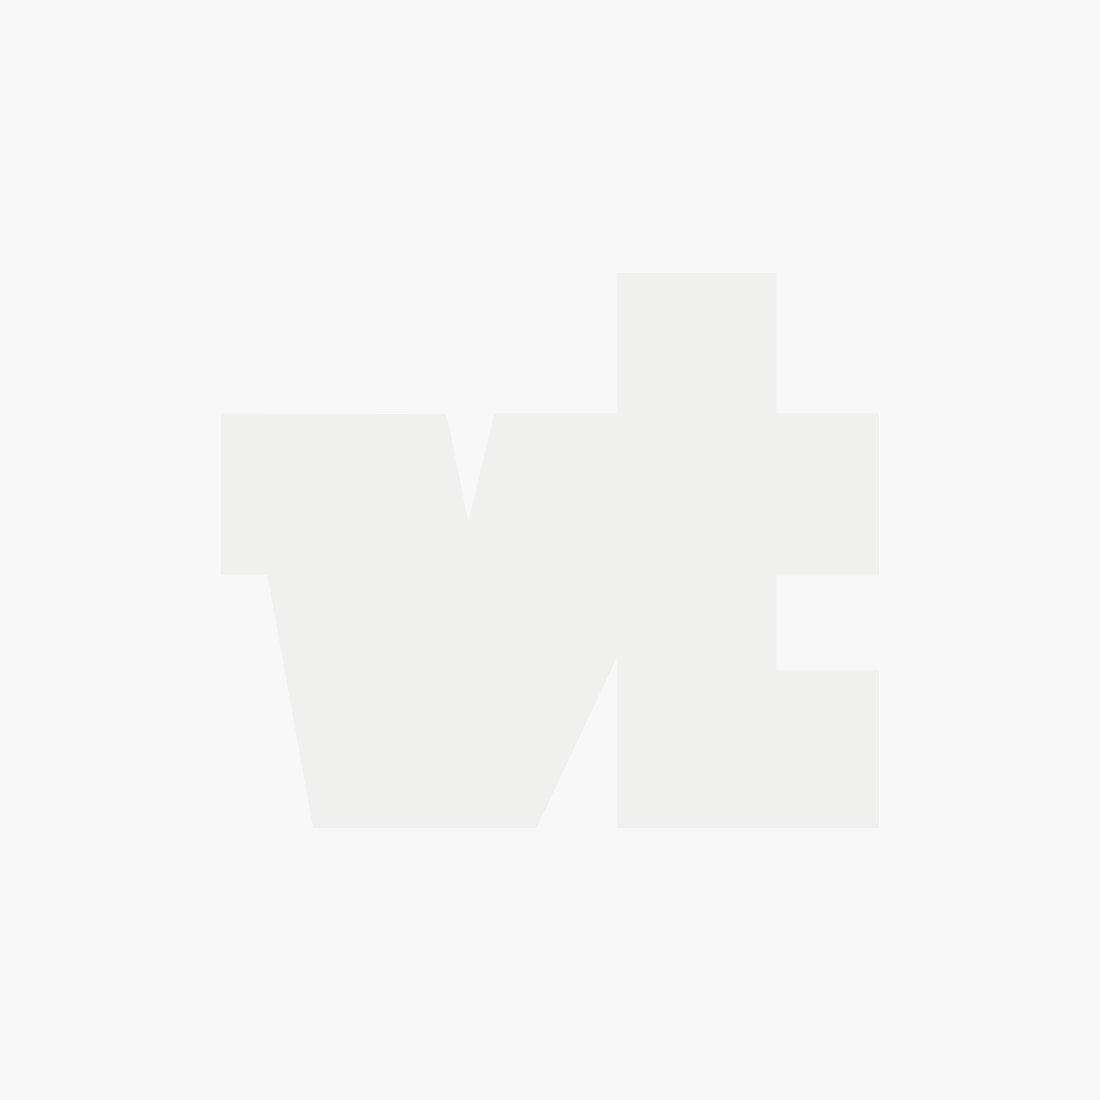 R-neck single jersey ss t-shirt